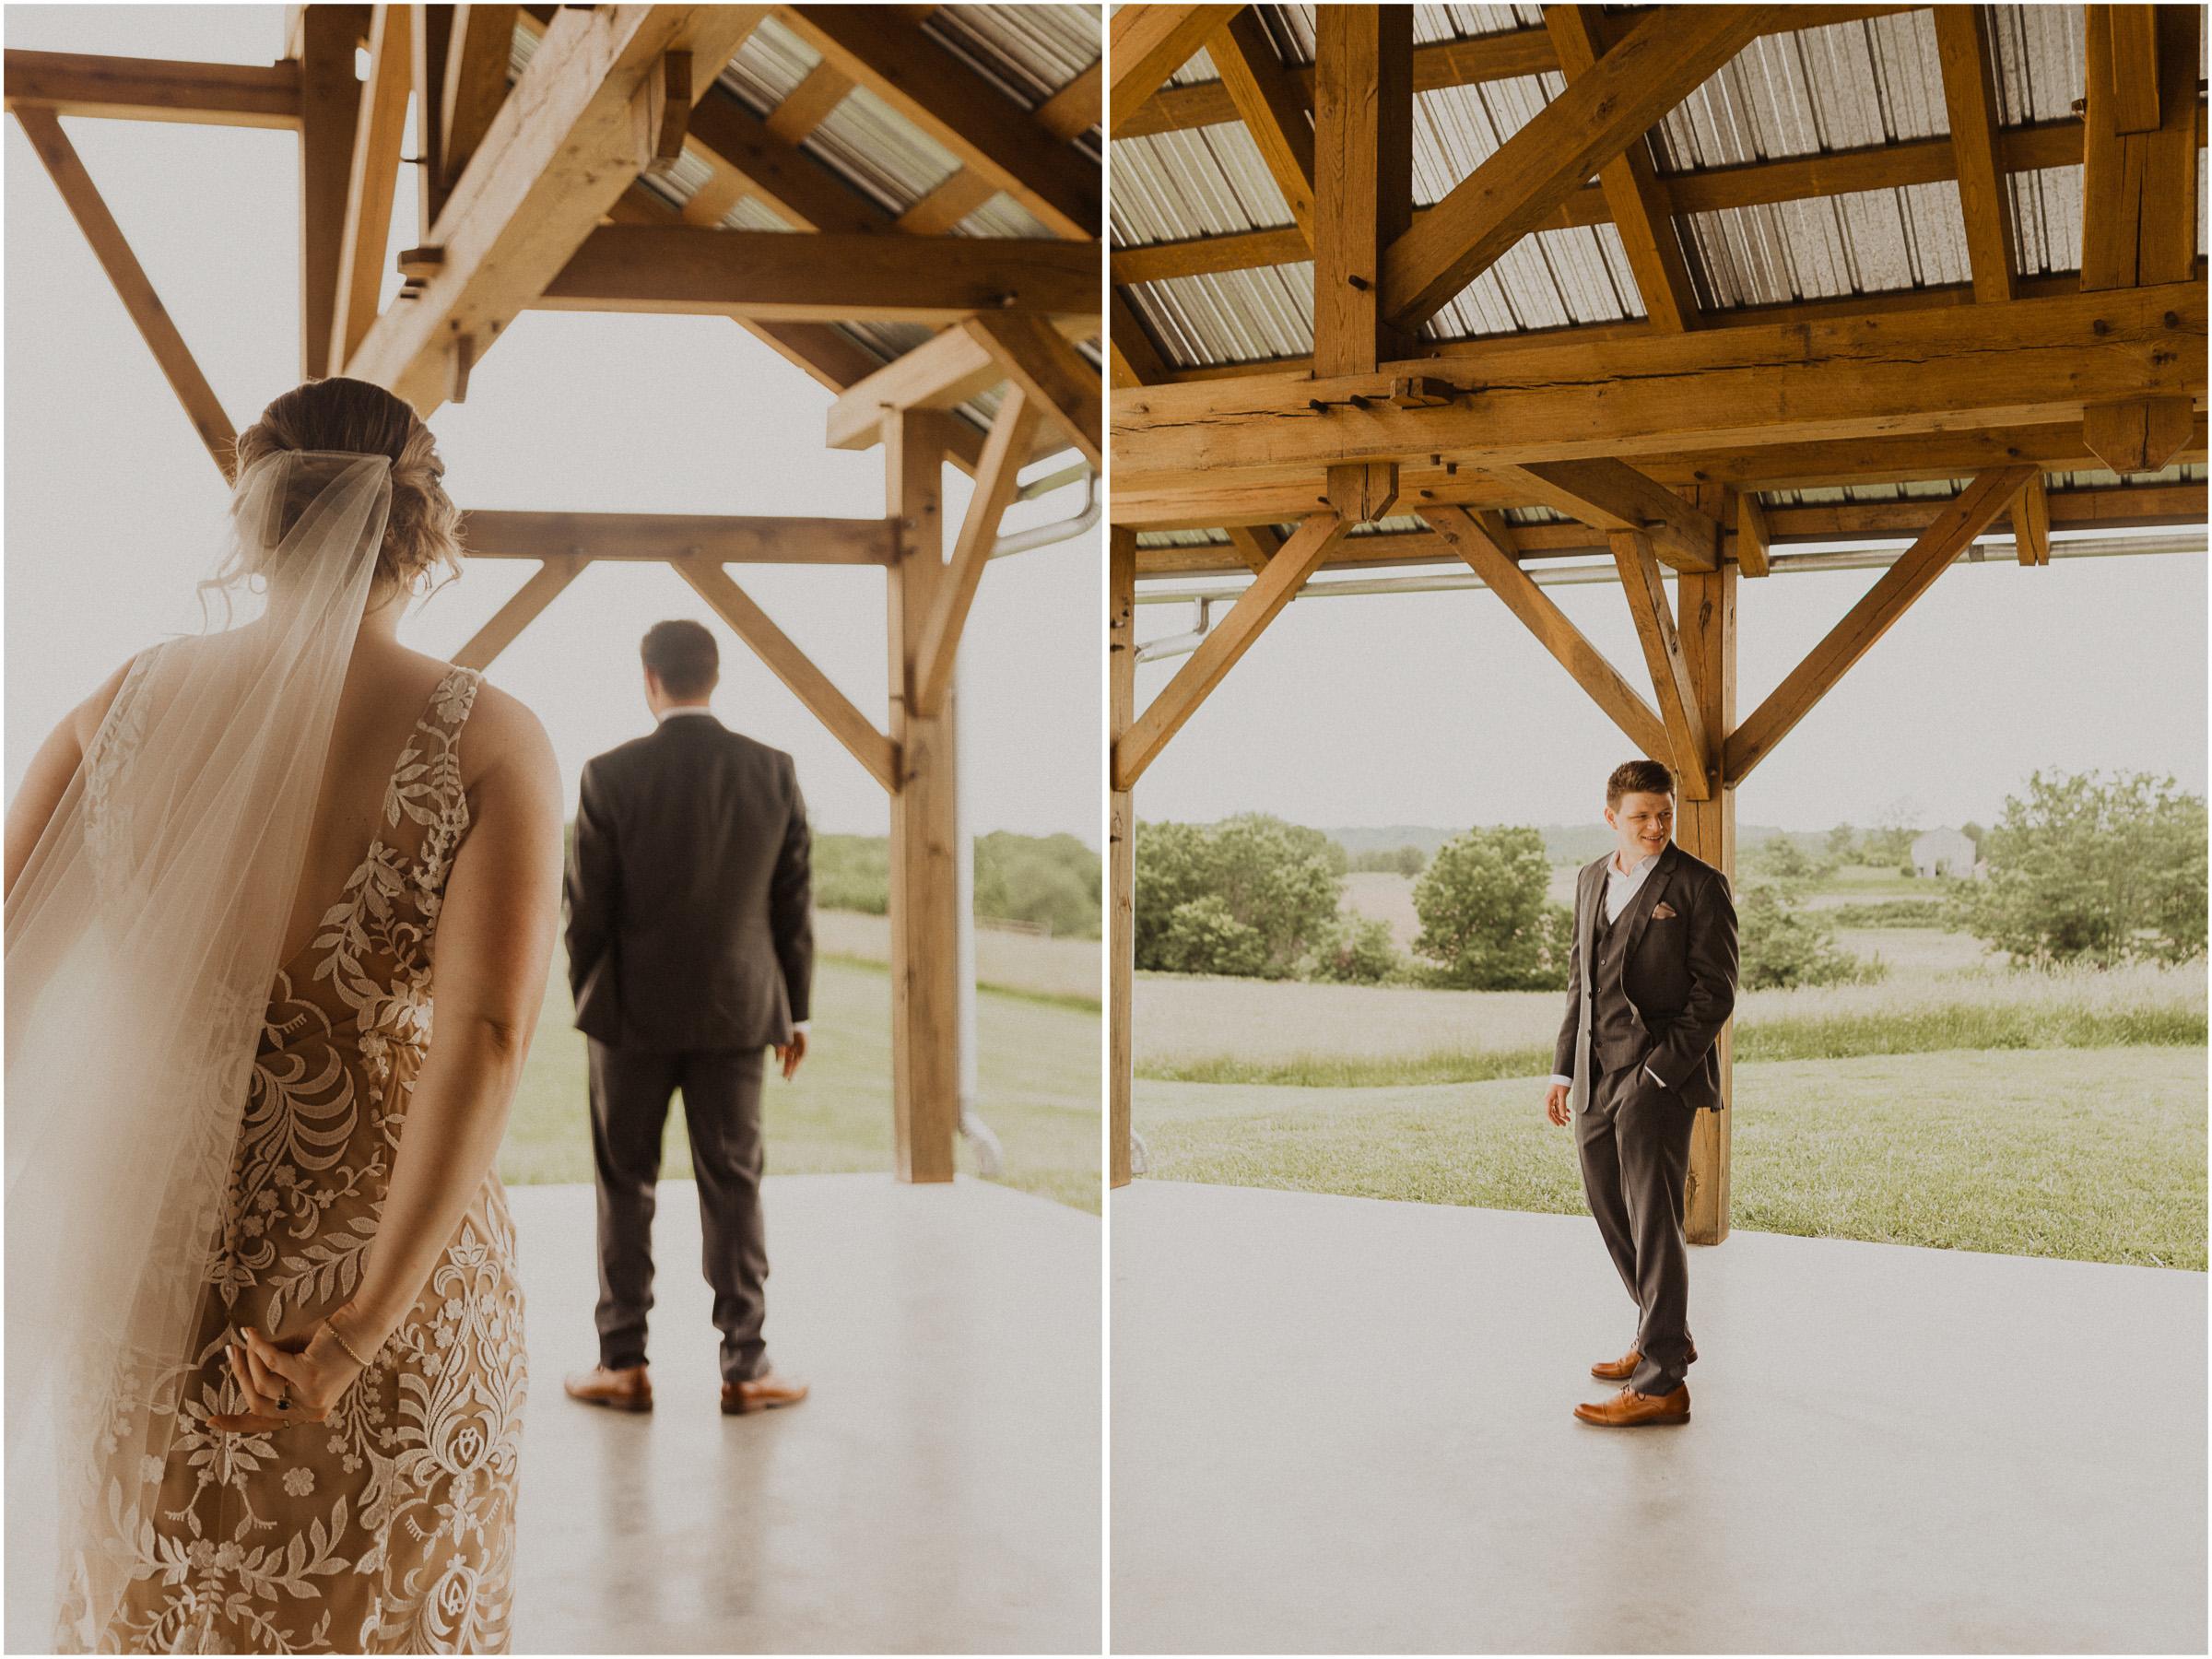 alyssa barletter photography weston red barn farm timberbarn summer outdoor wedding-10.jpg